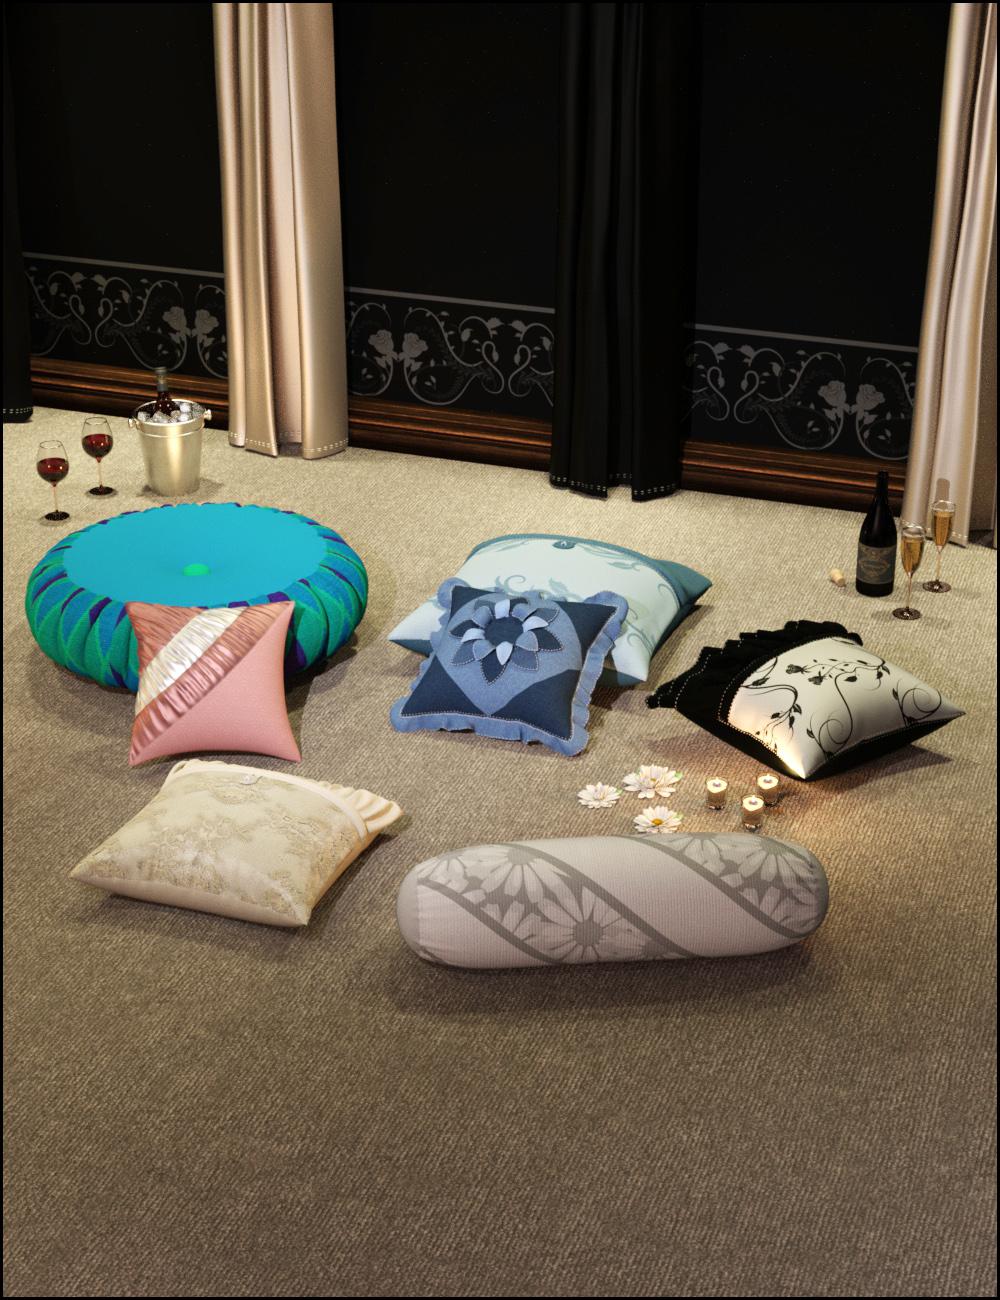 Decorative Pillows by: ARTCollab, 3D Models by Daz 3D